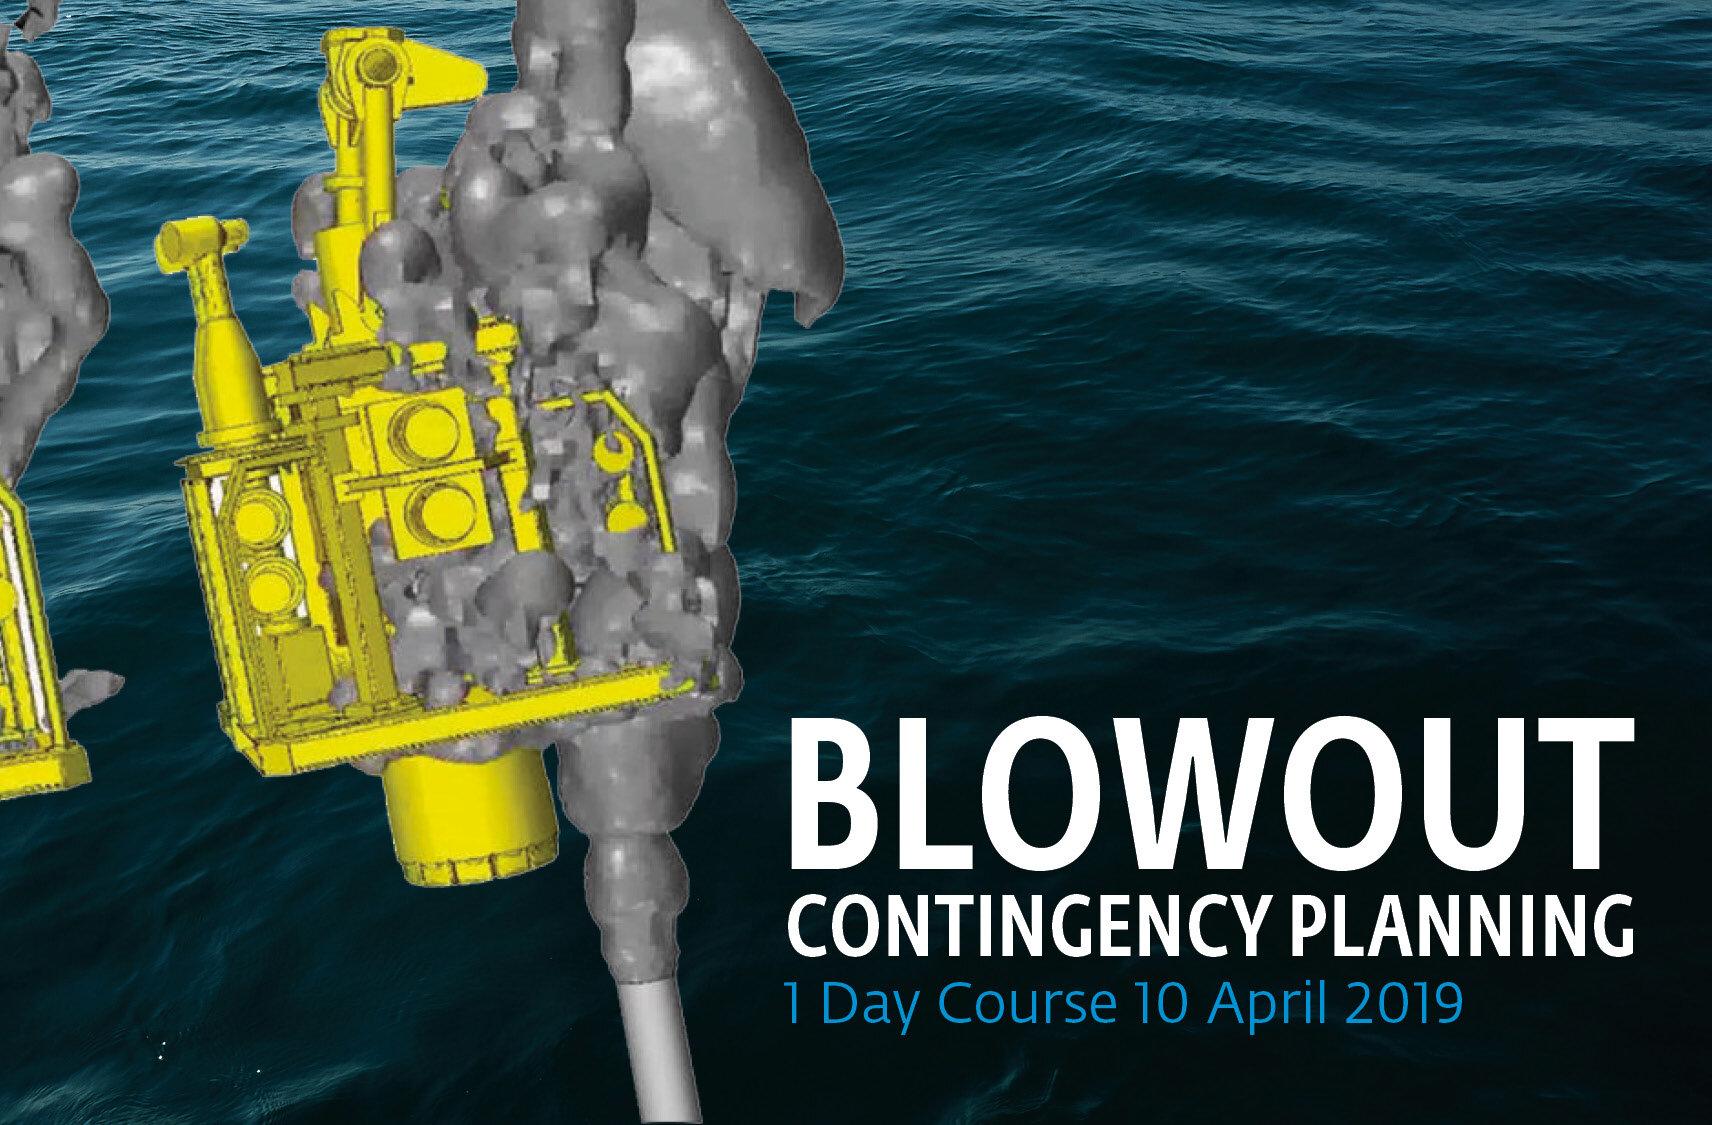 AE_Web_Image_Banner_Blowout_Planning_Stavanger2.jpg